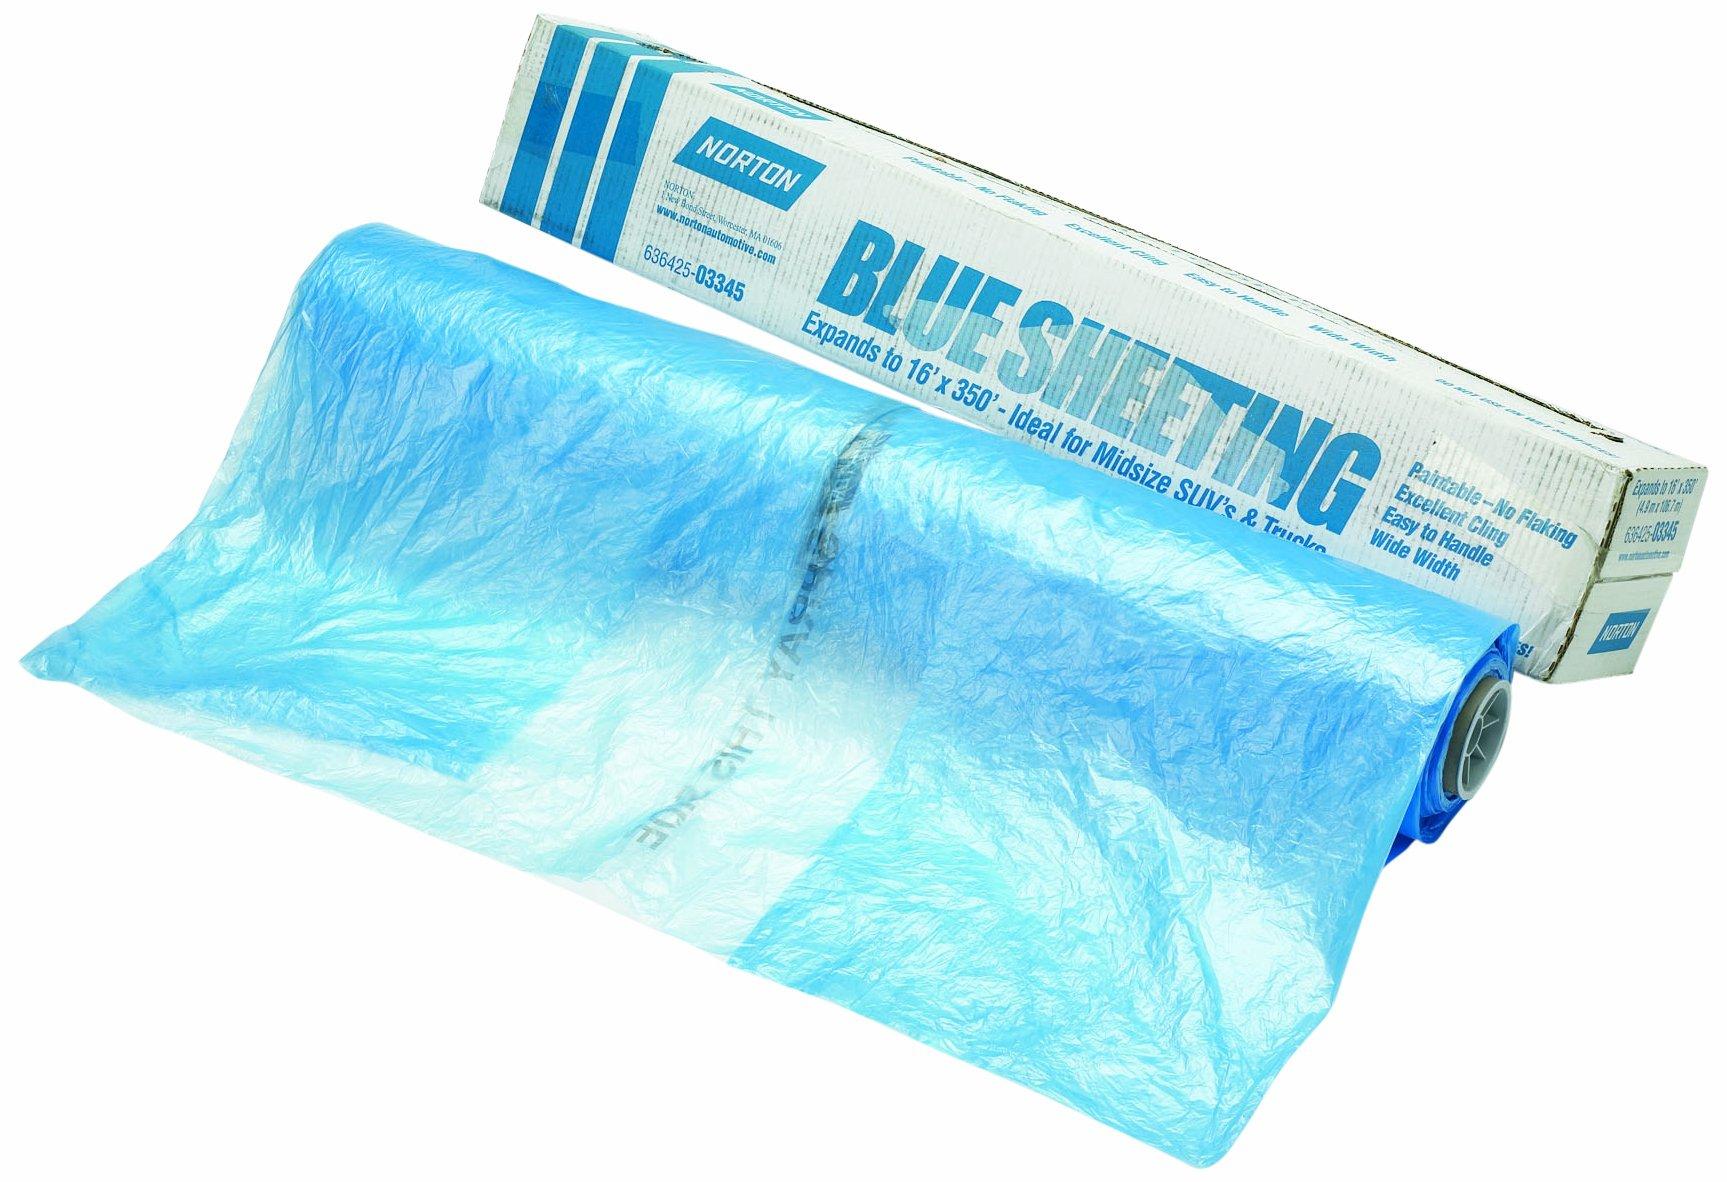 Norton 636425-03723 Blue 20' x 350' Sheeting by Norton